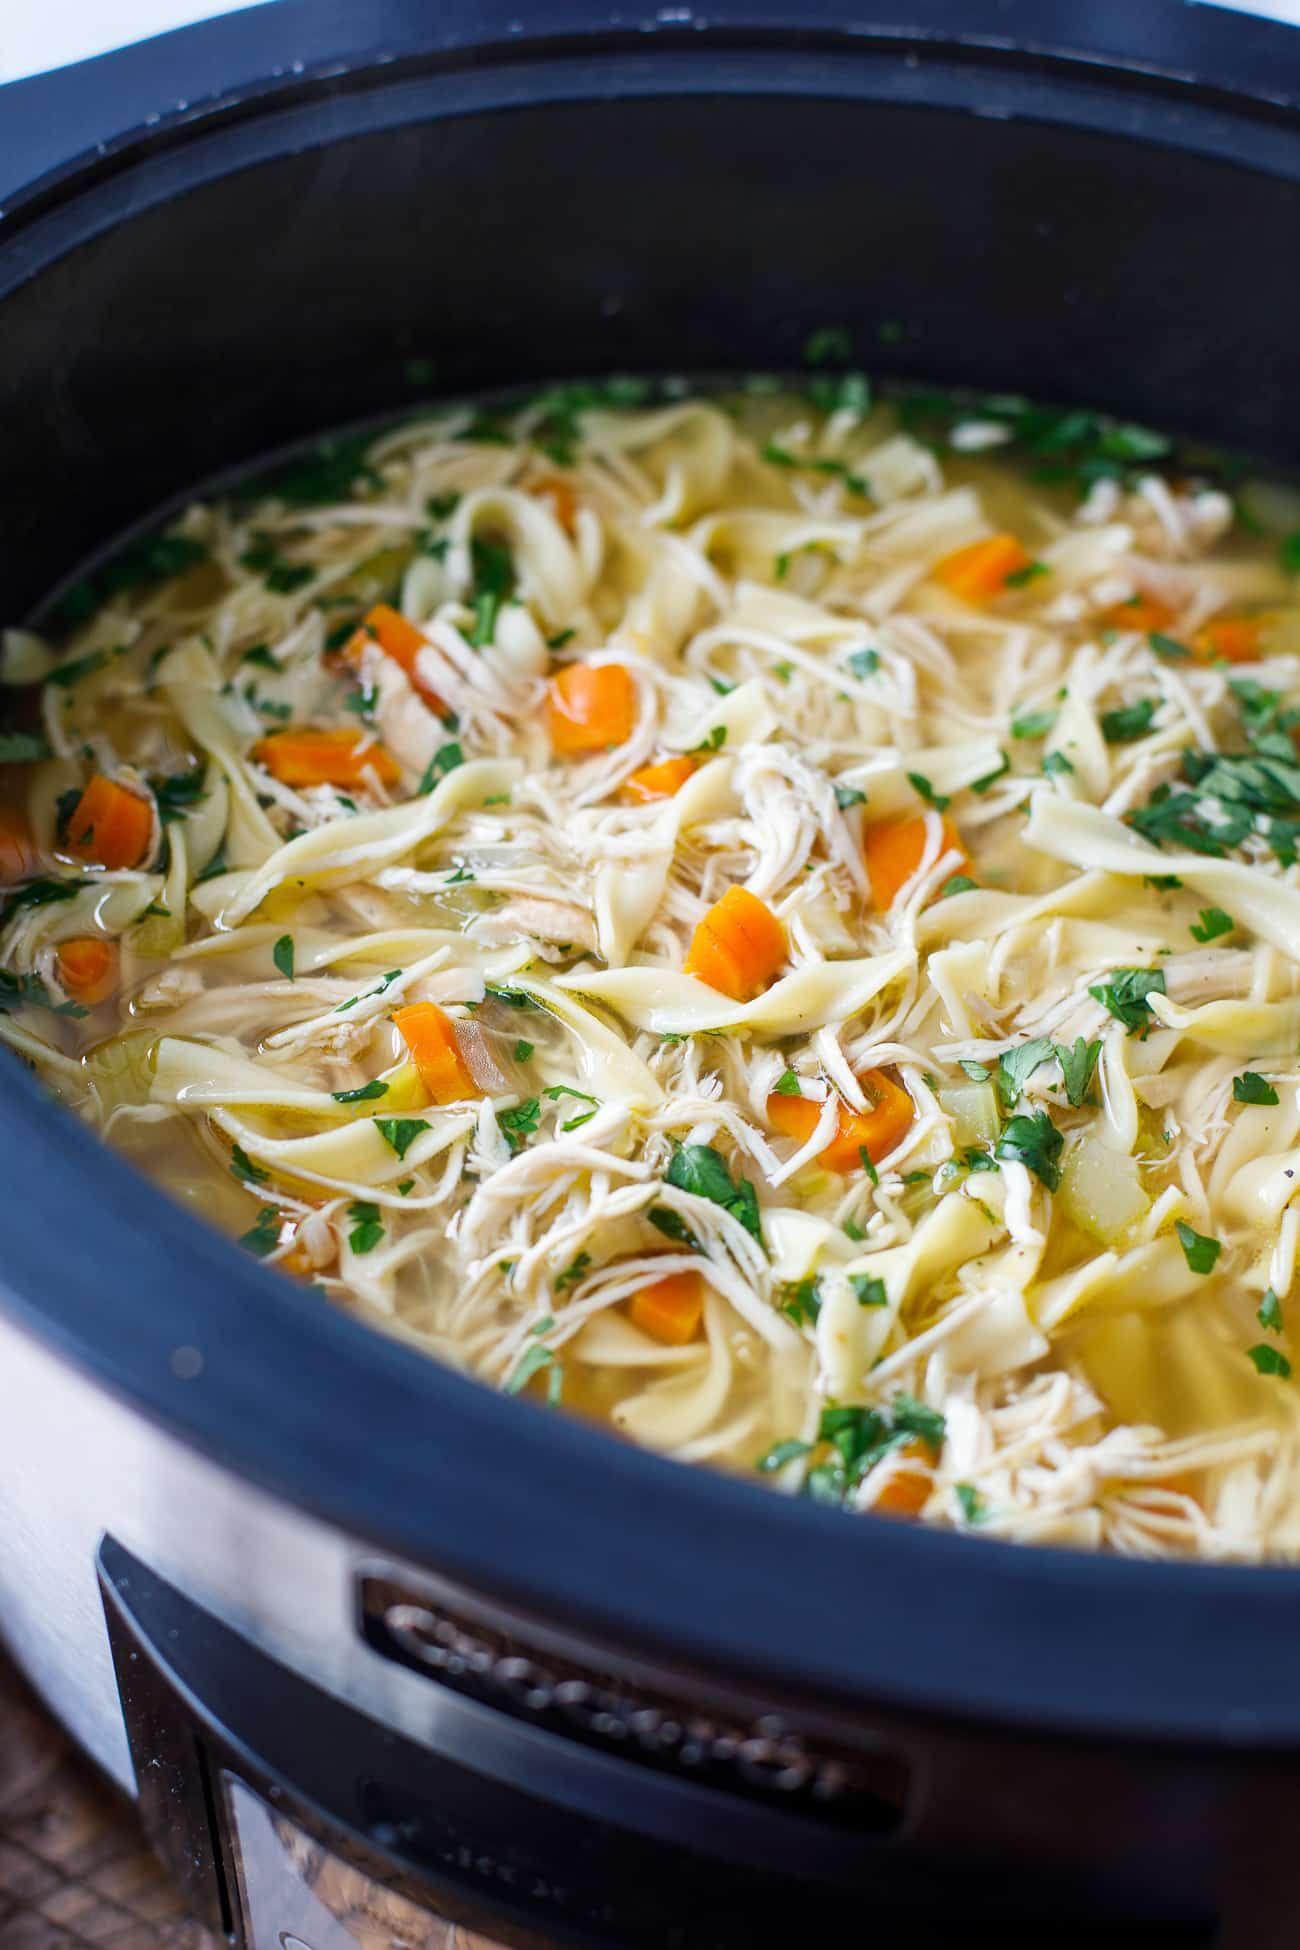 Crock Pot Chicken Noodle Soup Recipe Recipe Soup Recipes Slow Cooker Slow Cooker Soup Chicken Slow Cooker Recipes